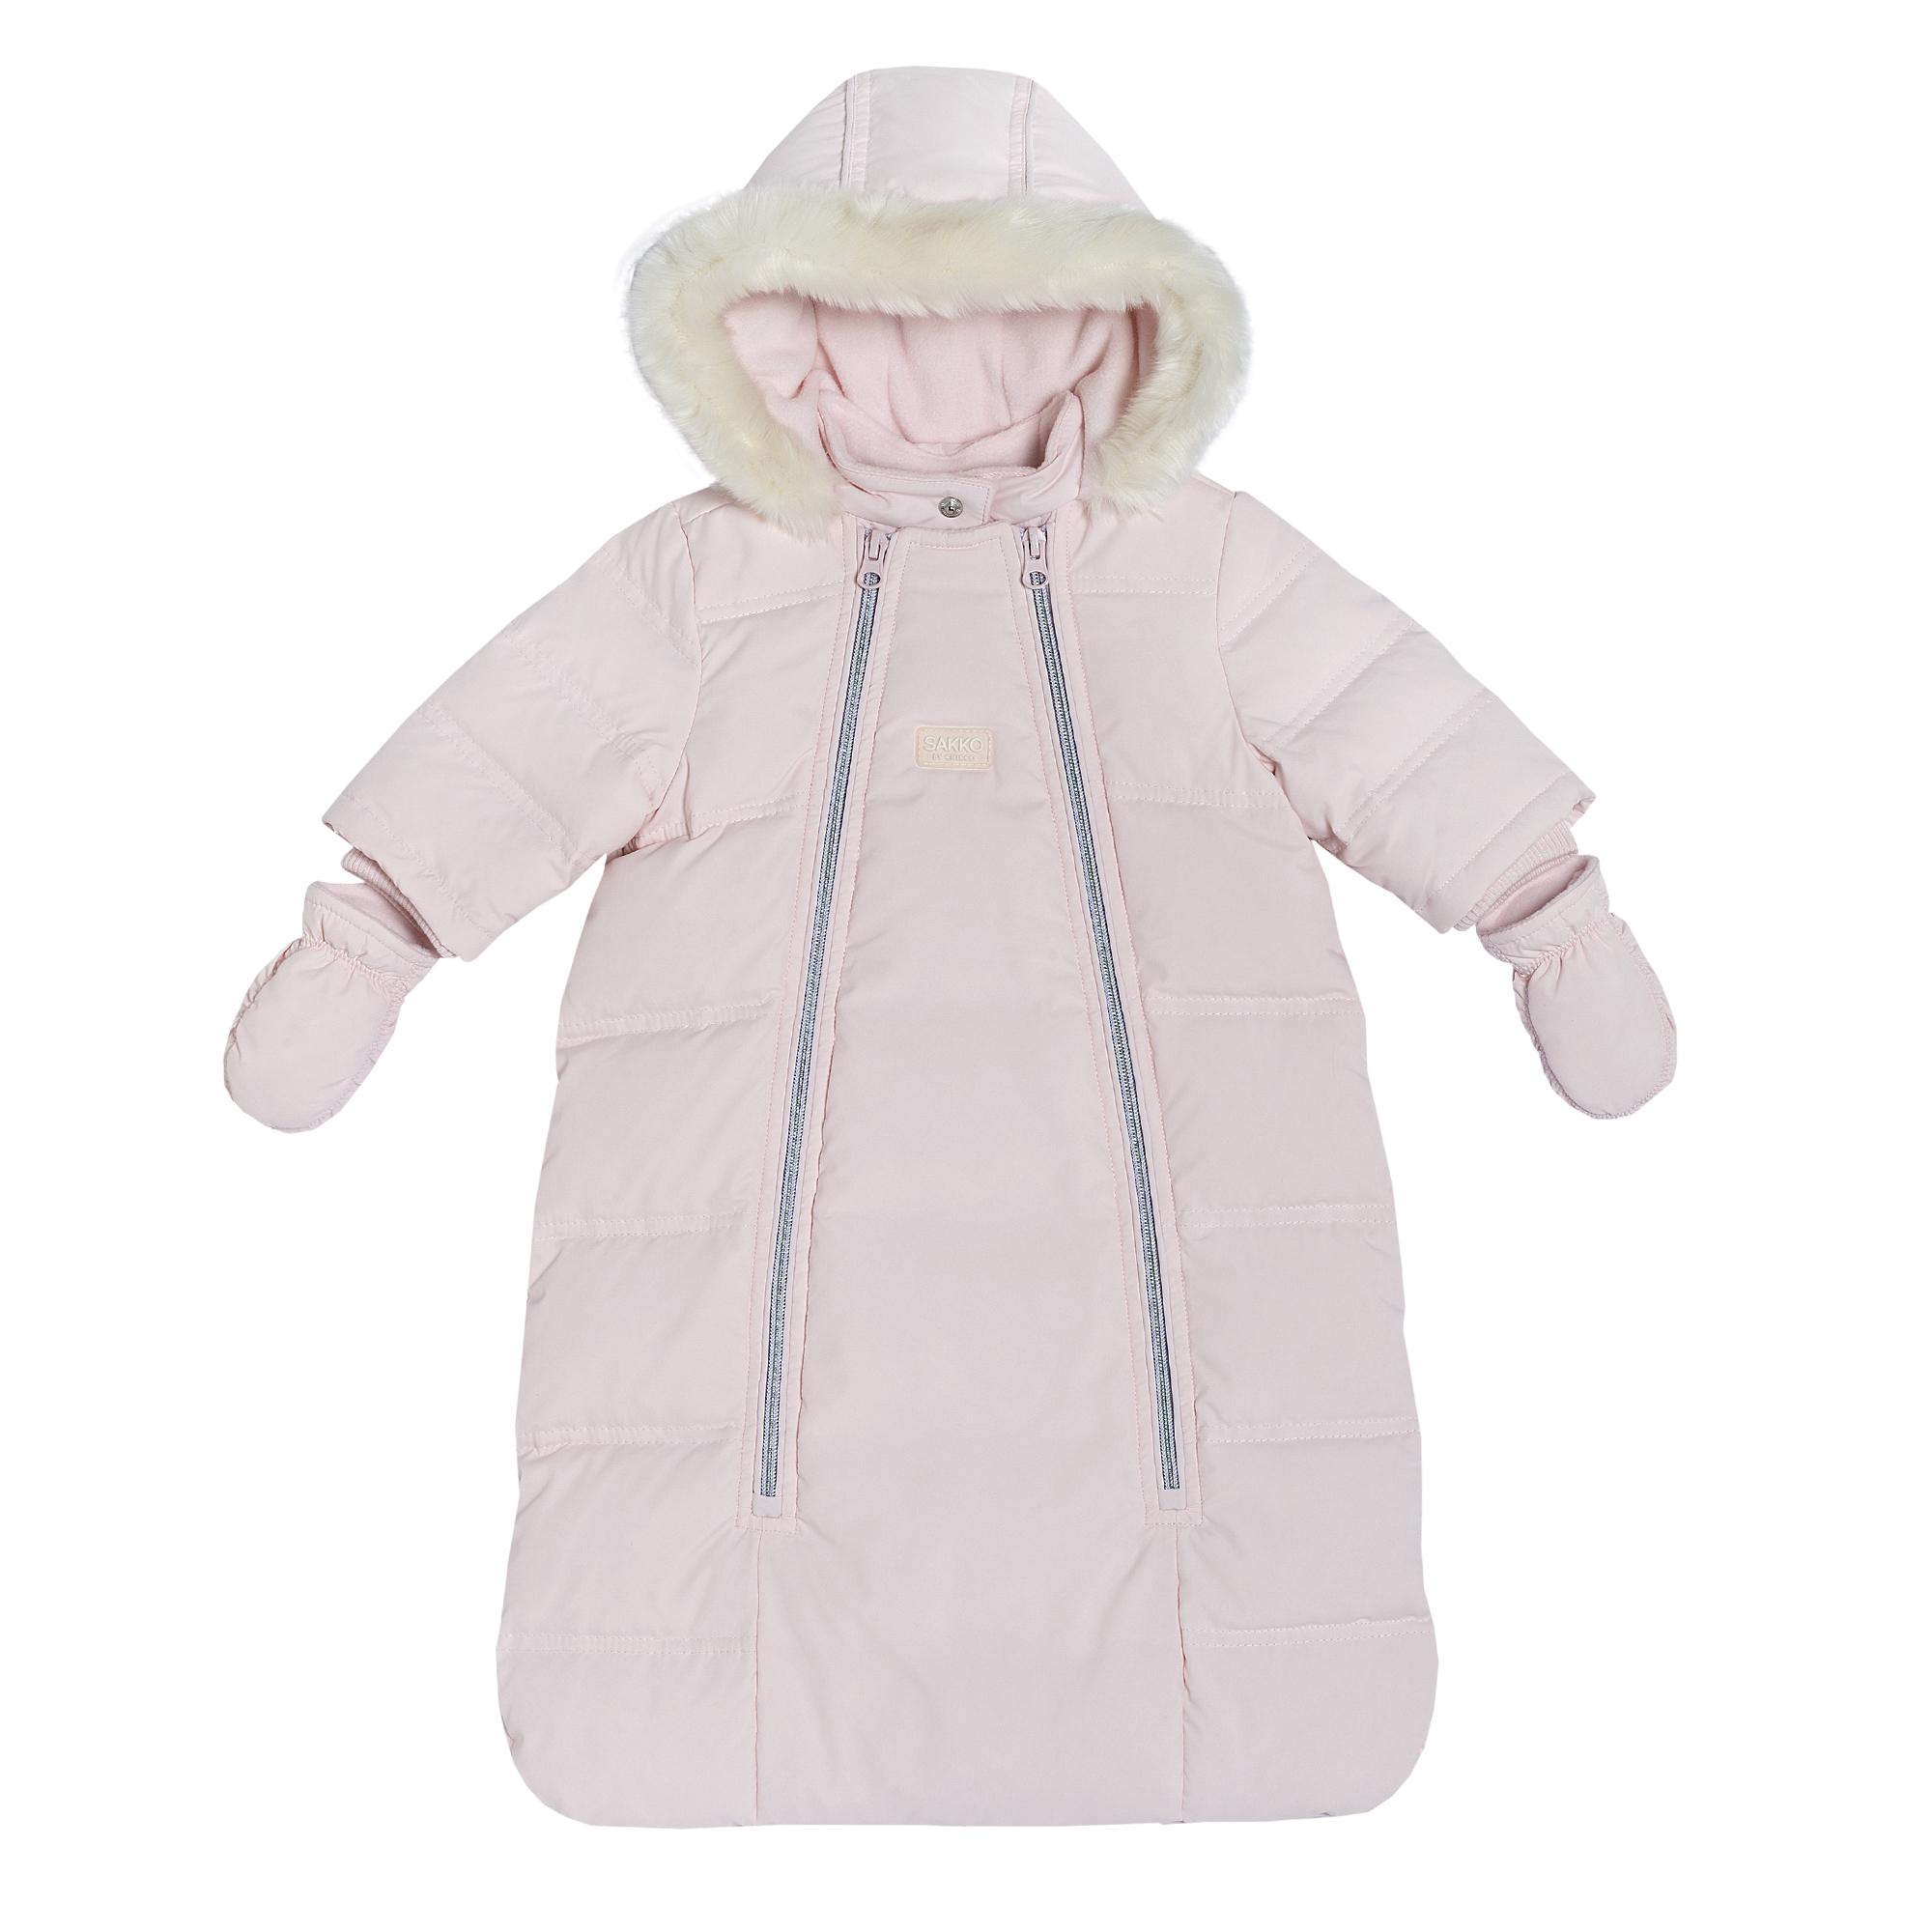 Sac de dormit pentru copii Chicco Sakko, roz, 27063